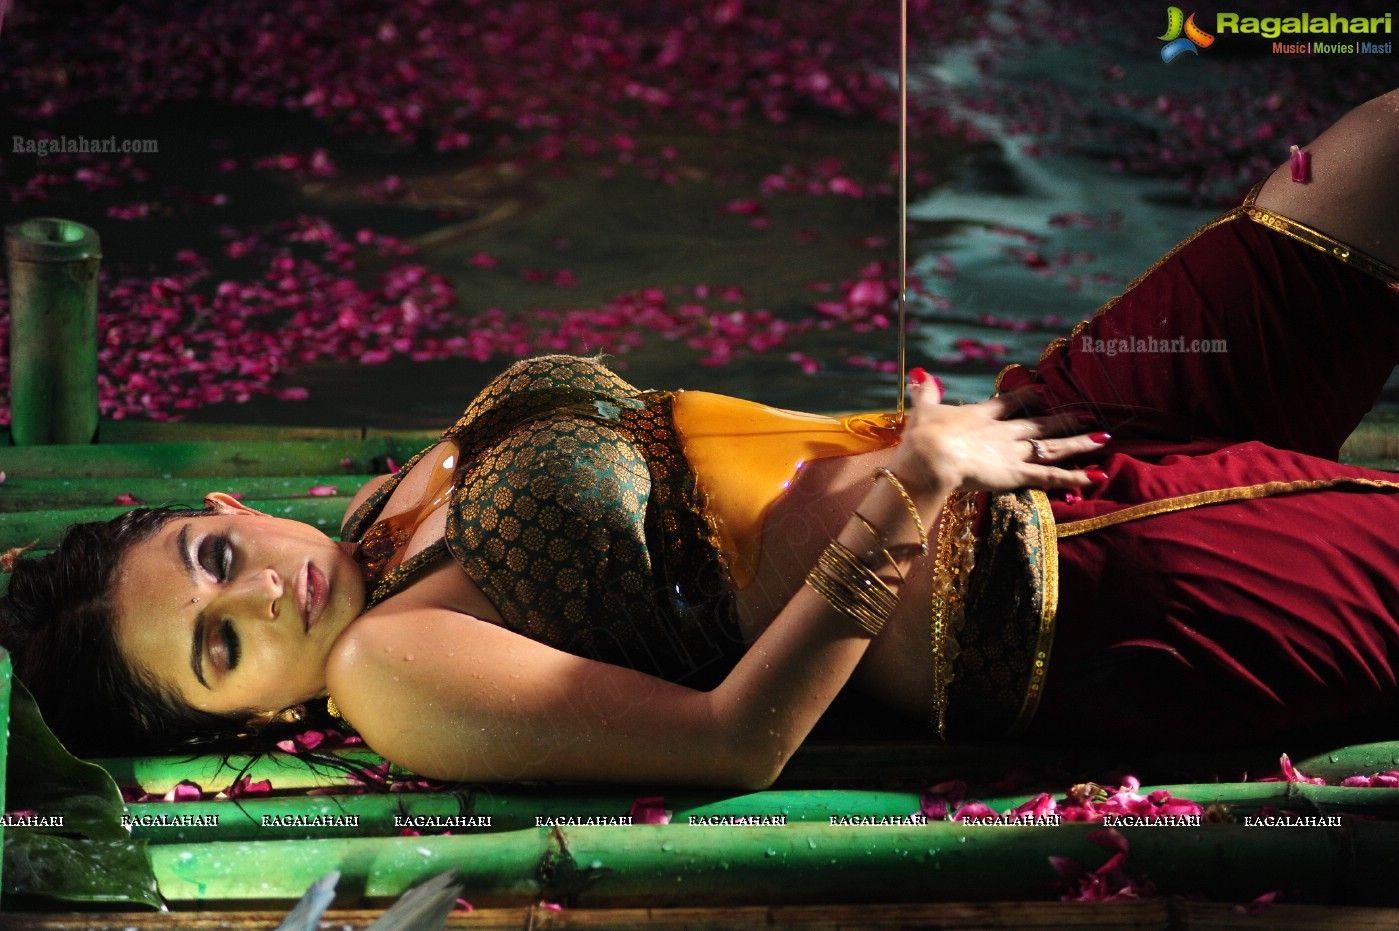 South Indian Movie actress: Sheena Shahabadi Hot Navel Photos